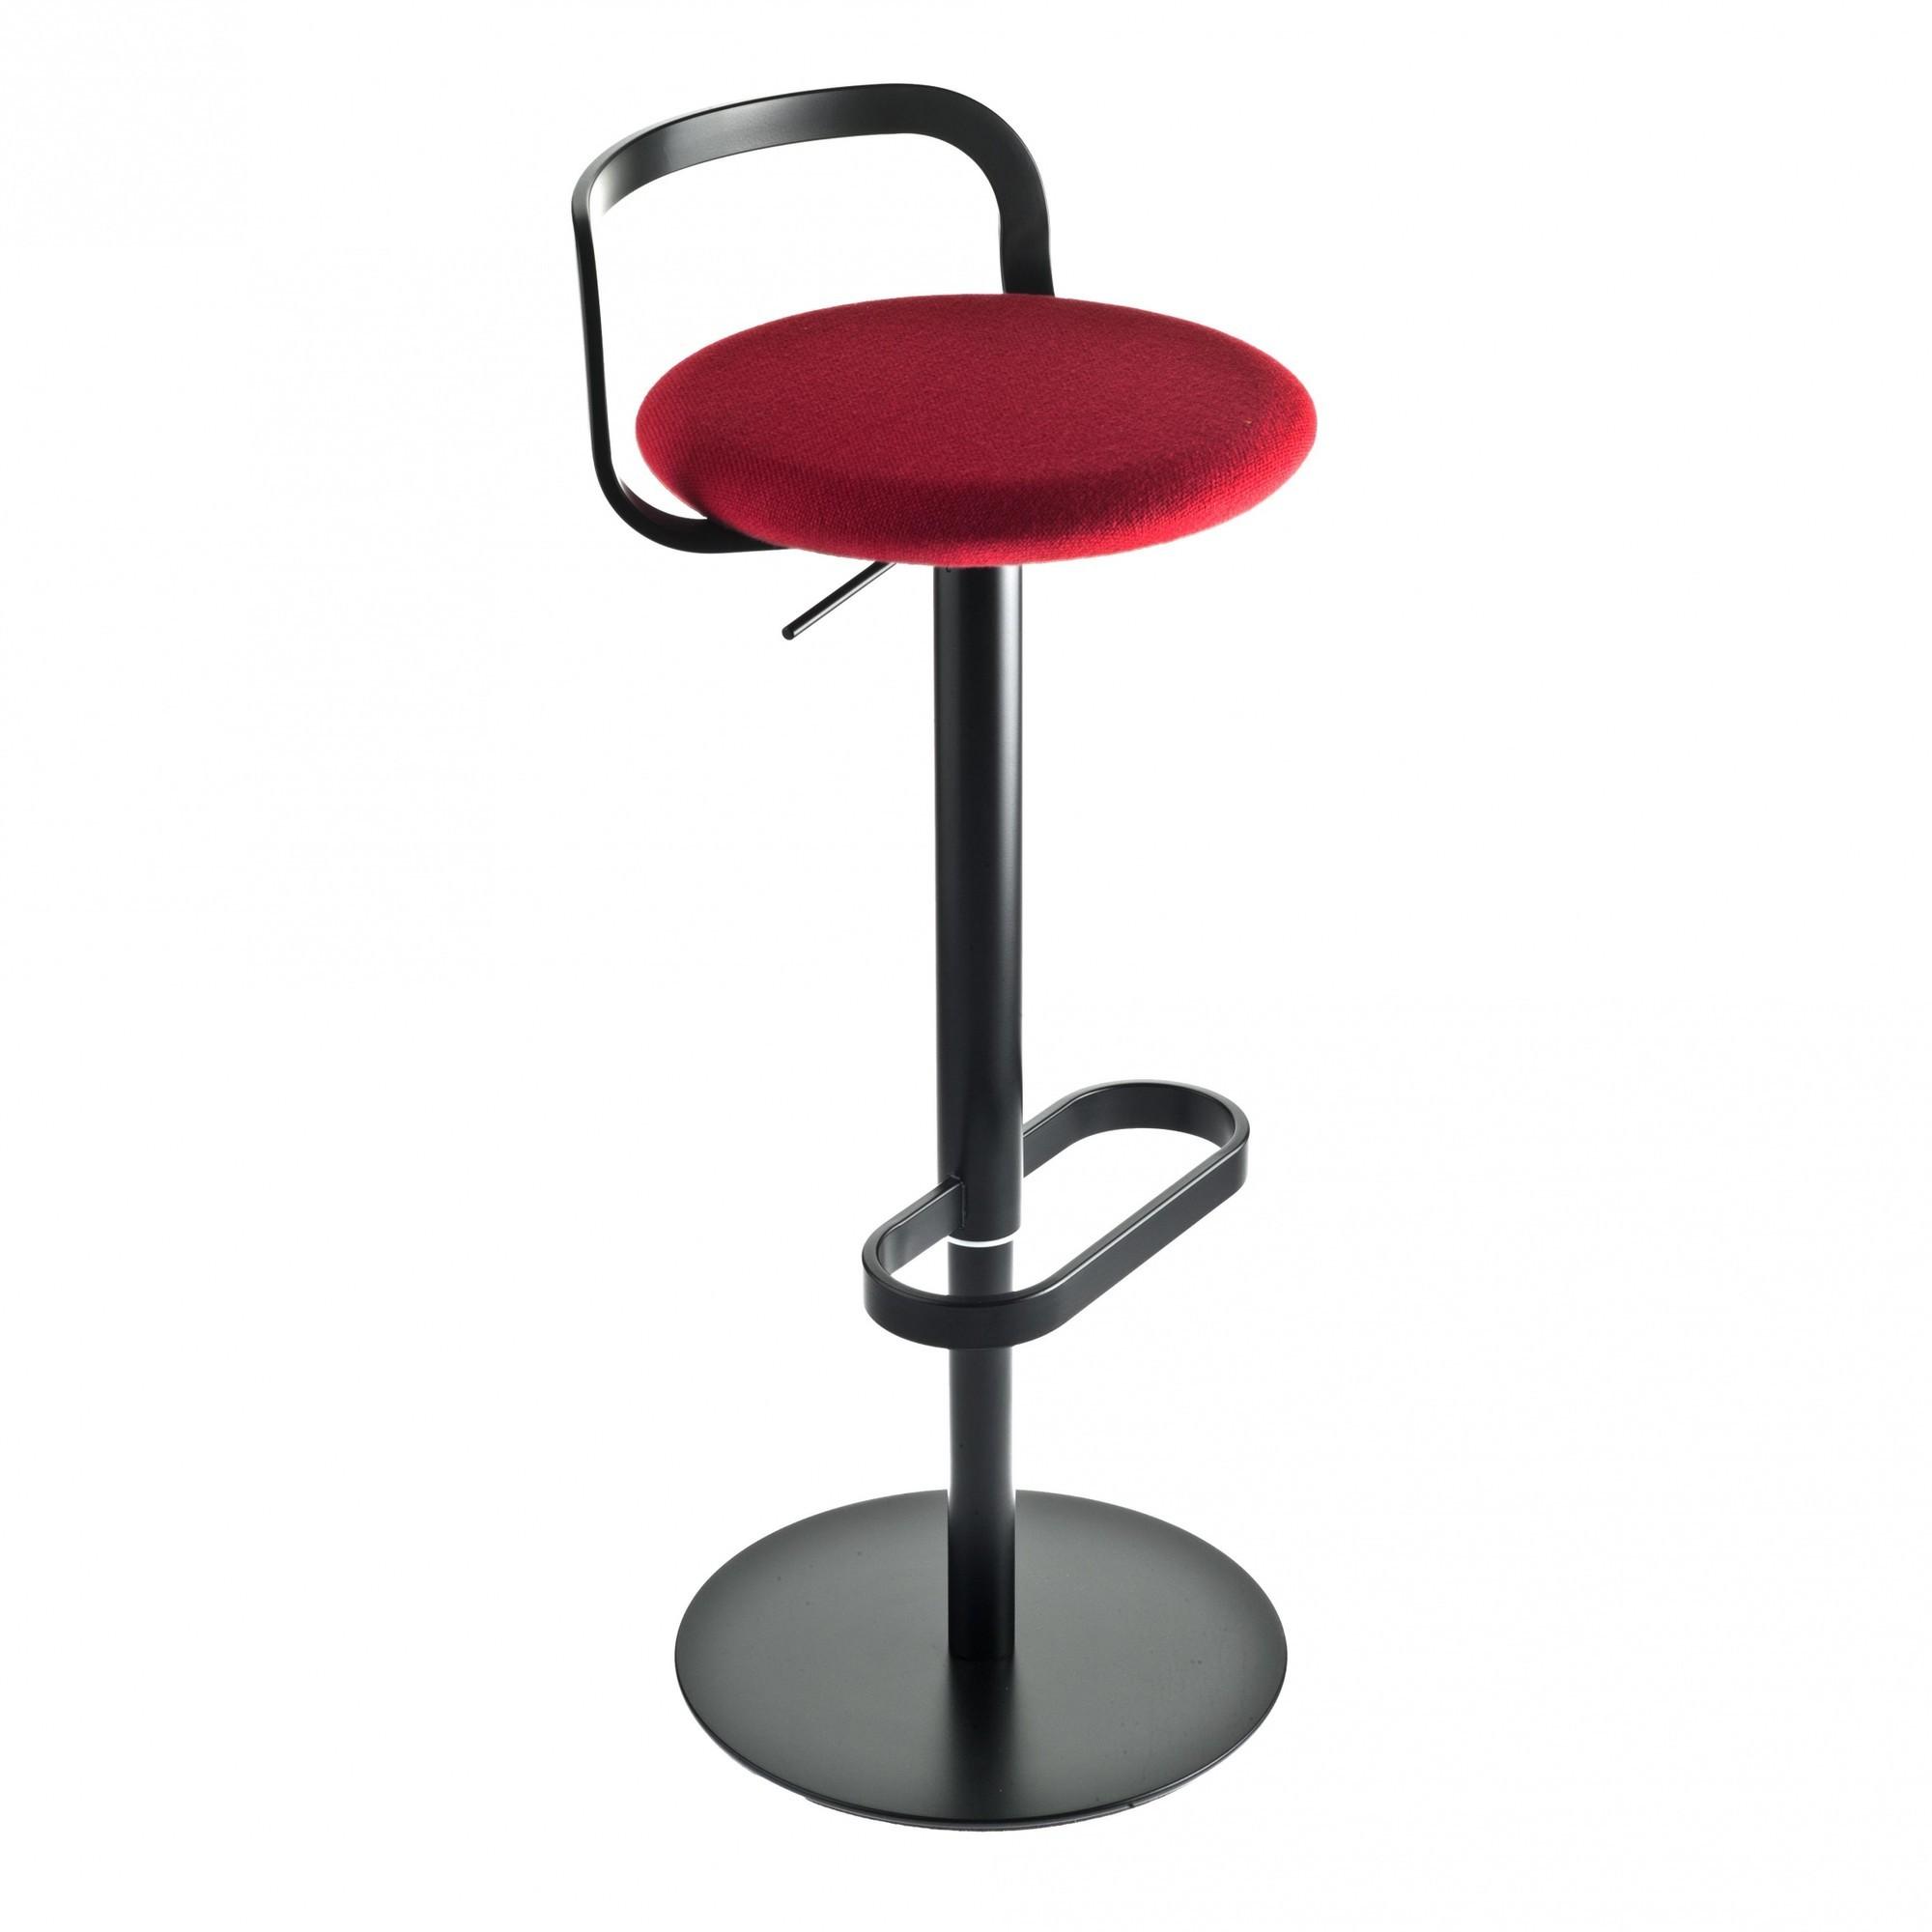 Bar Le French Flair mak s110 bar stool 55-80